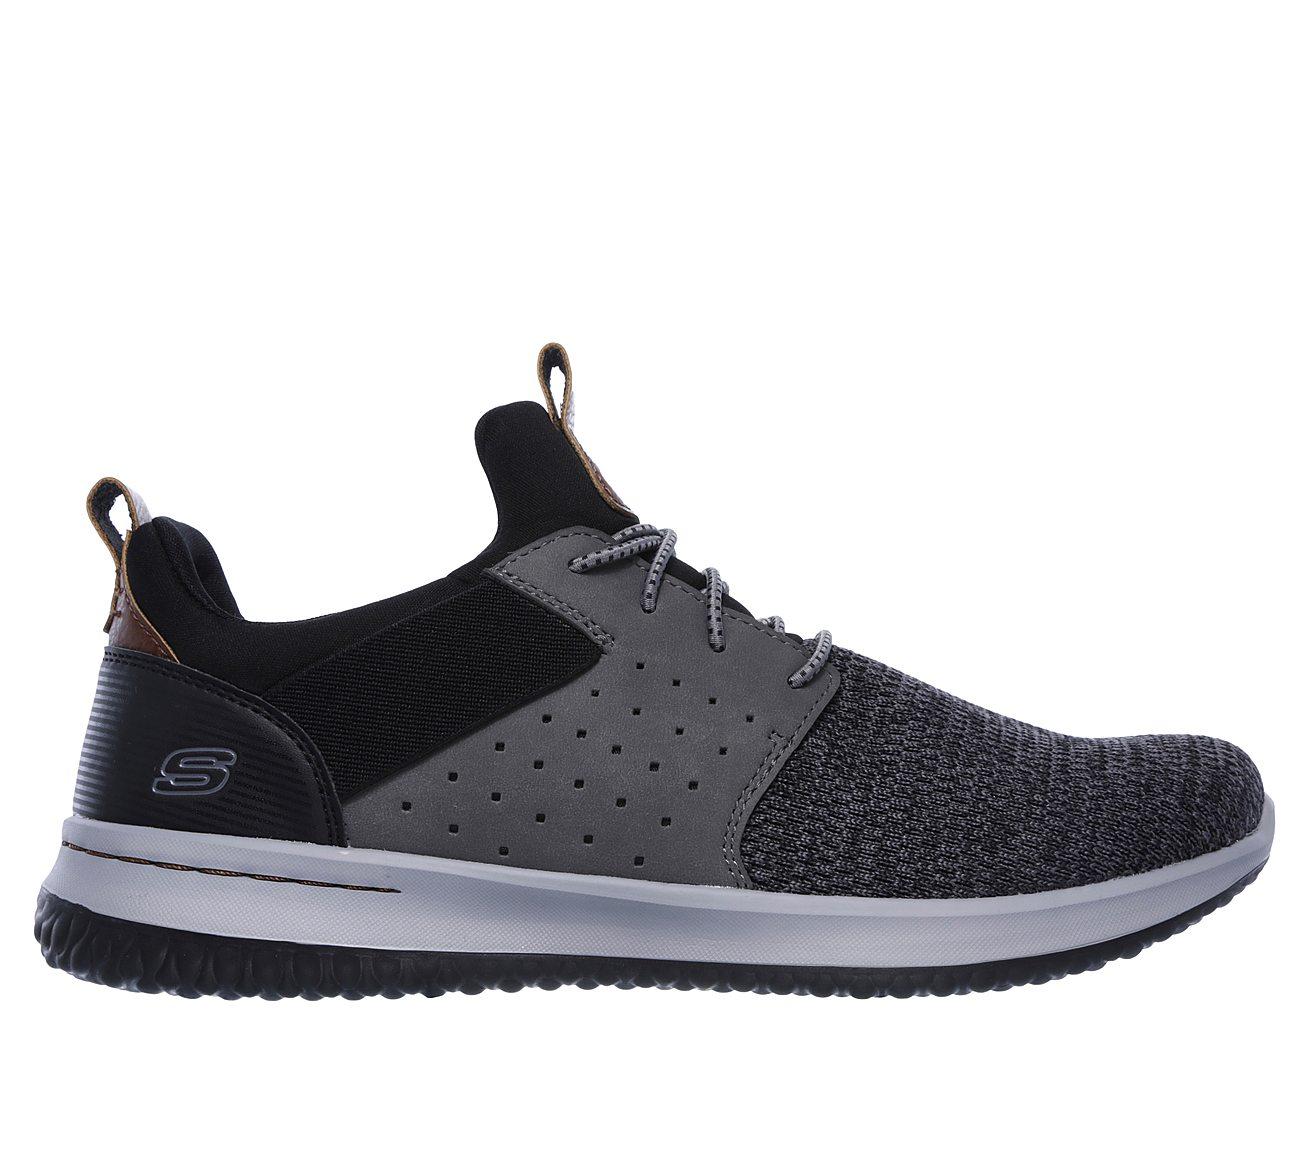 SKECHERS MEN'S Delson Camben Slip On Sneaker